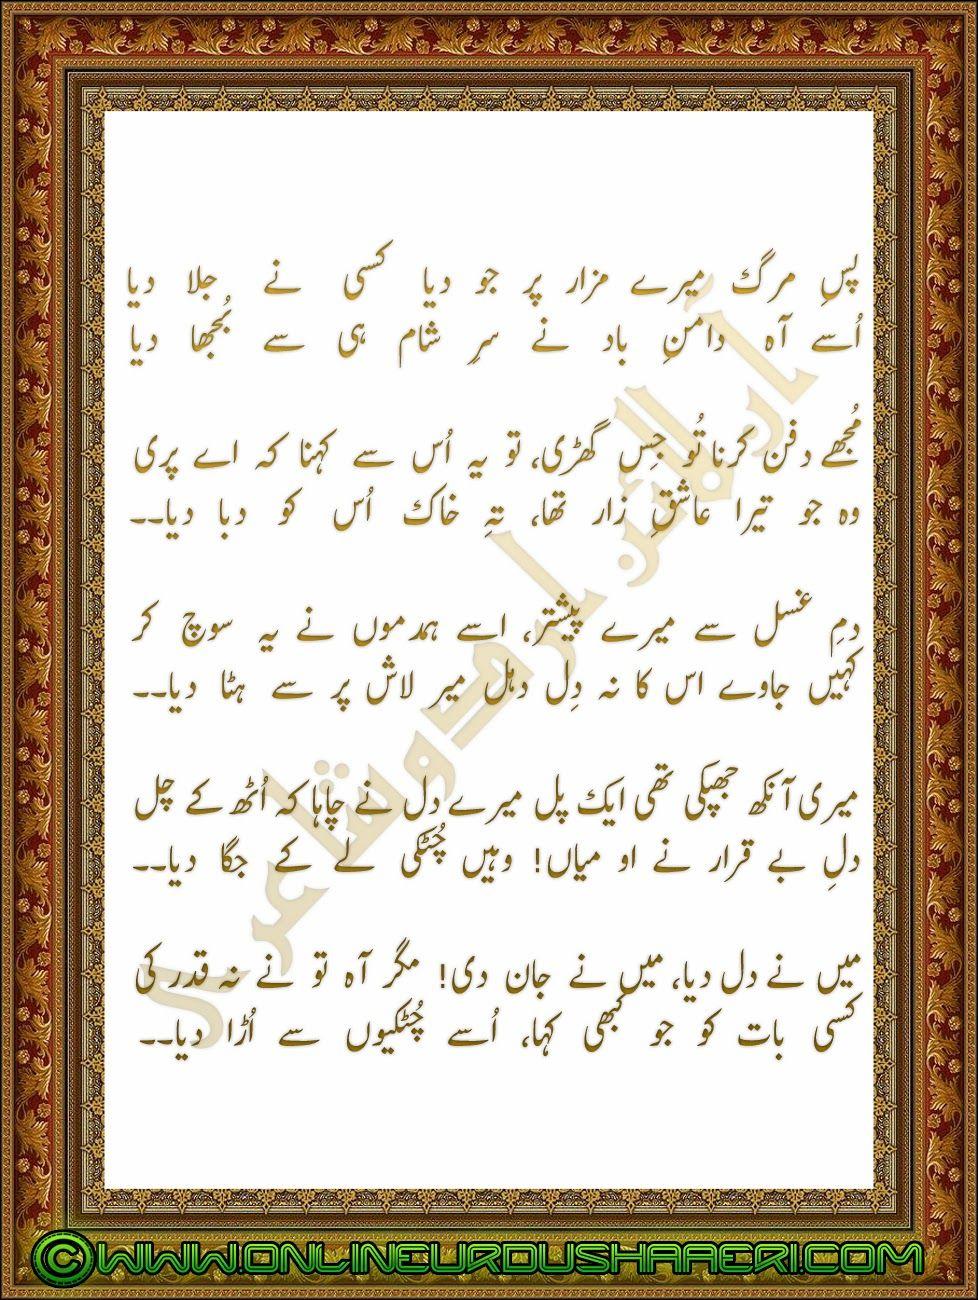 Urdu Love Poetry, Love Urdu Poetry, Urdu Poetry On Love, Love Poetry ...